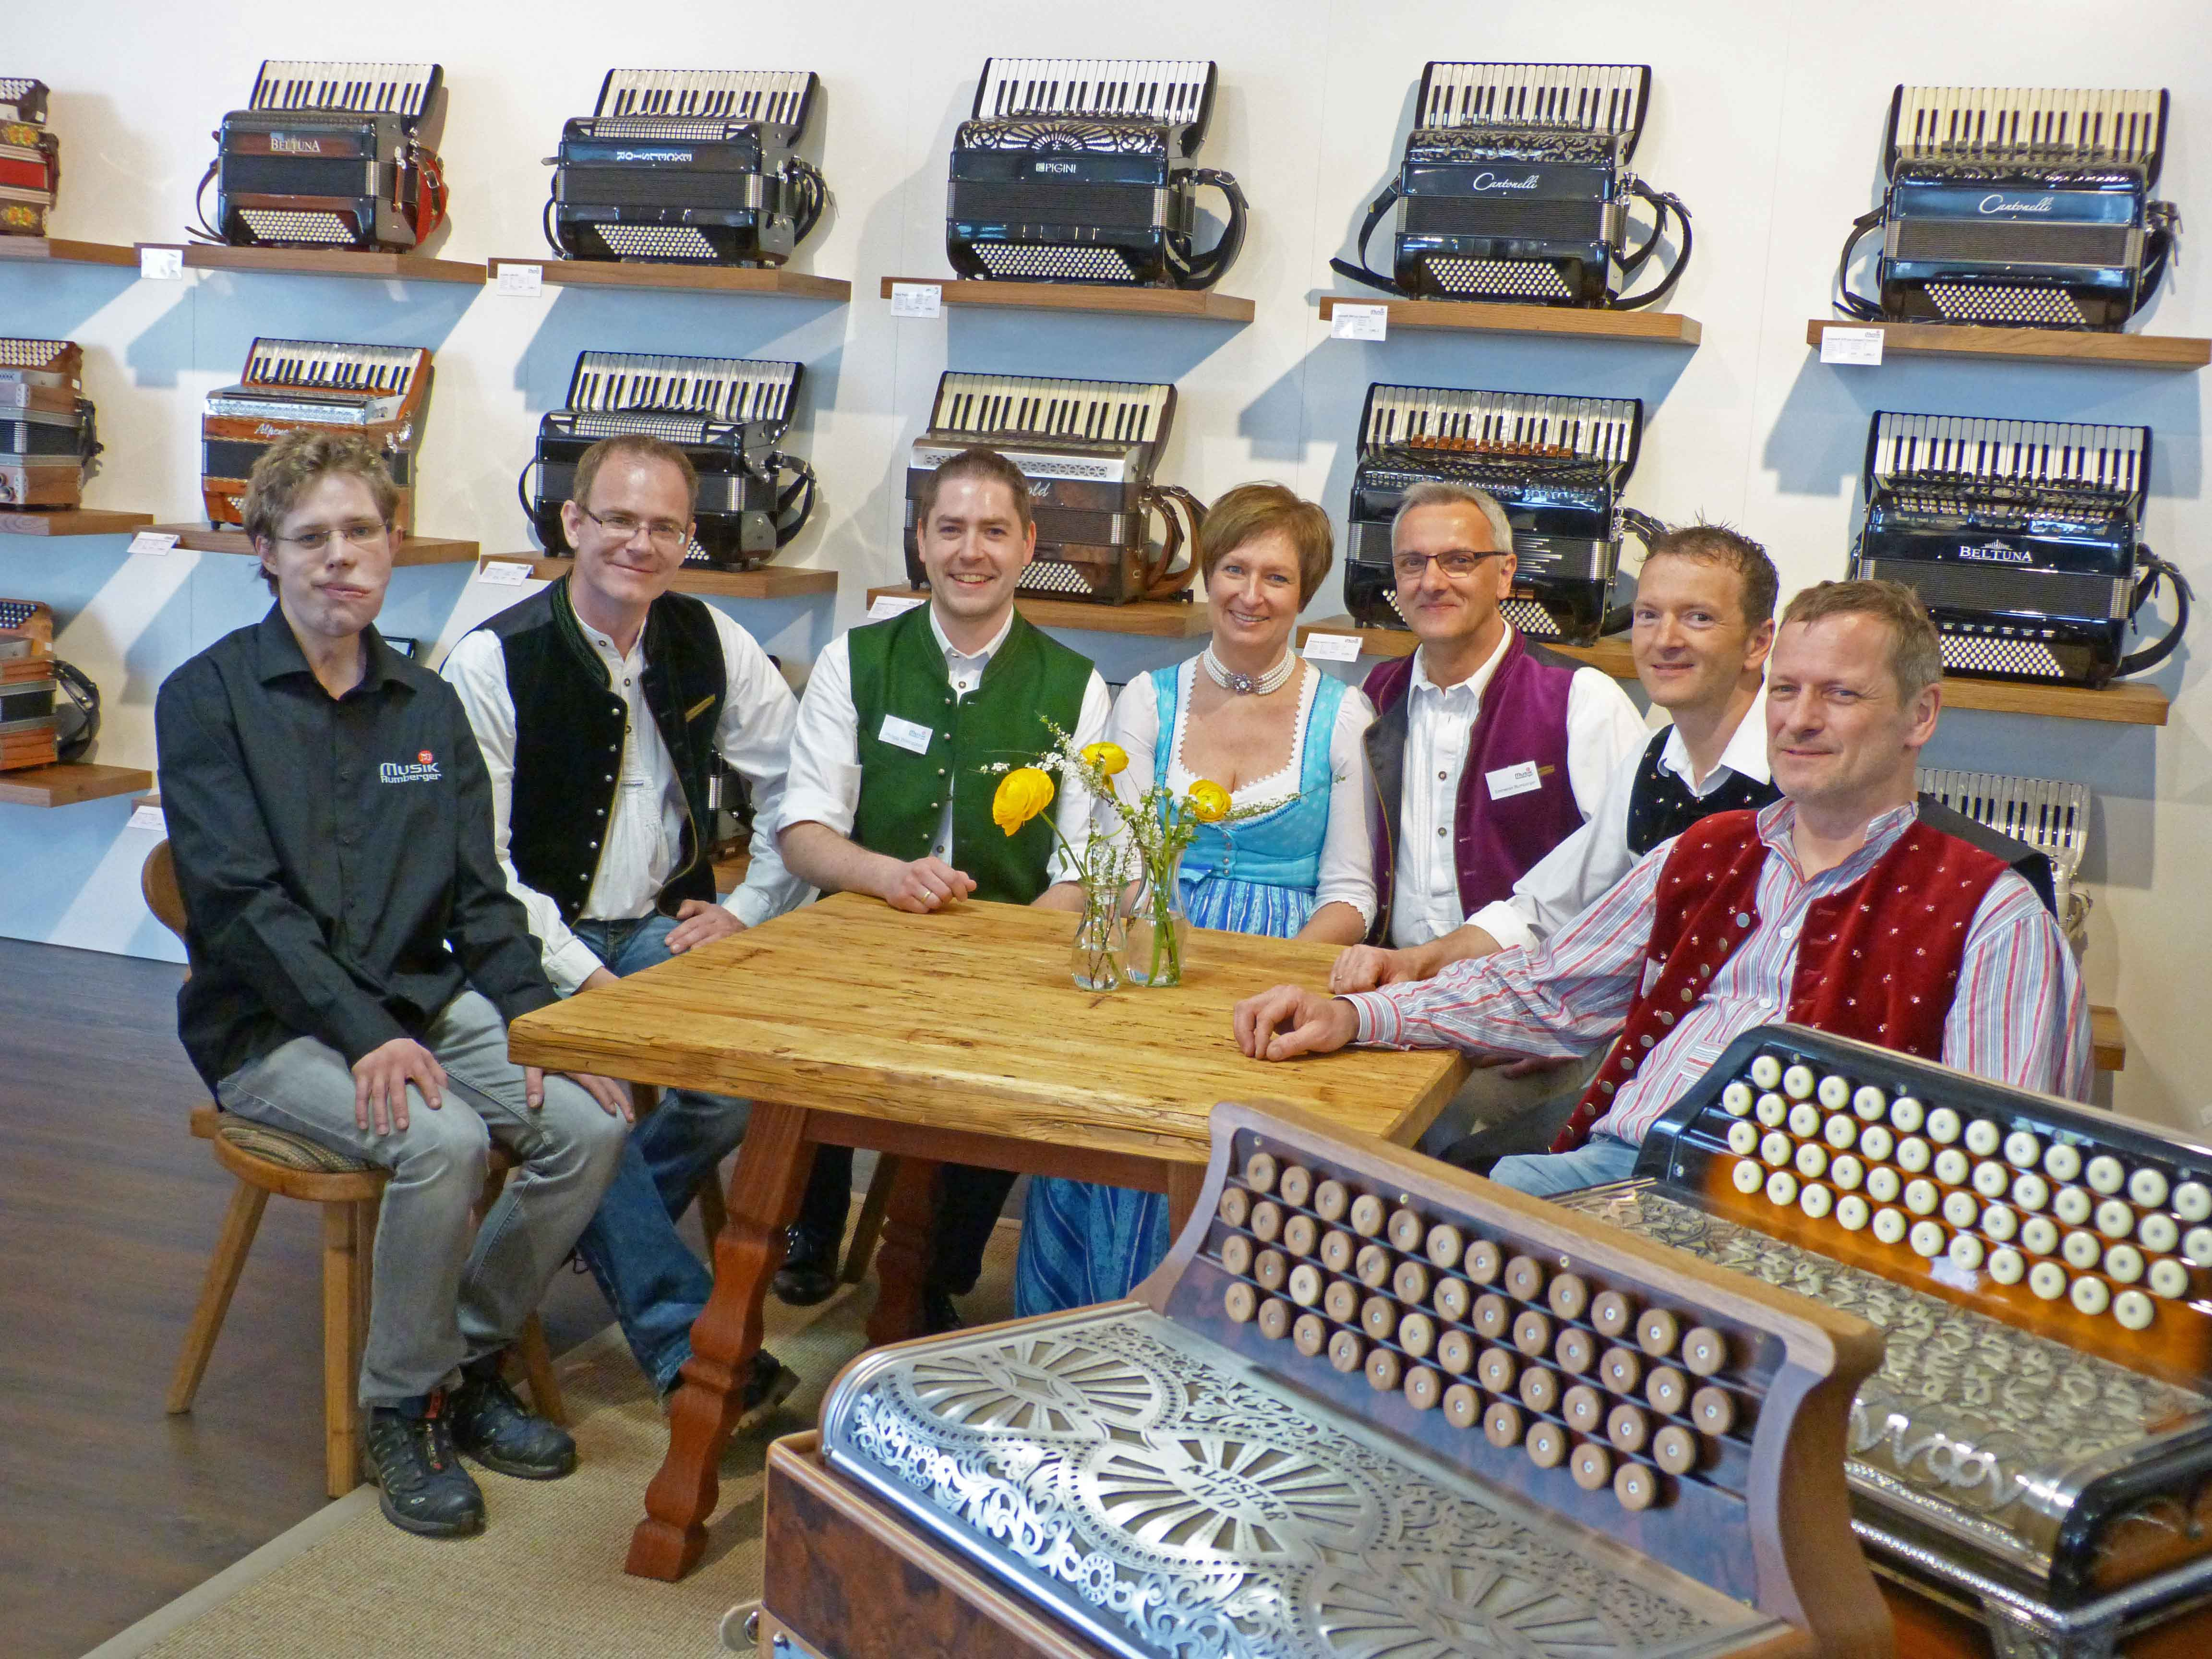 Musik-Rumberger-Team